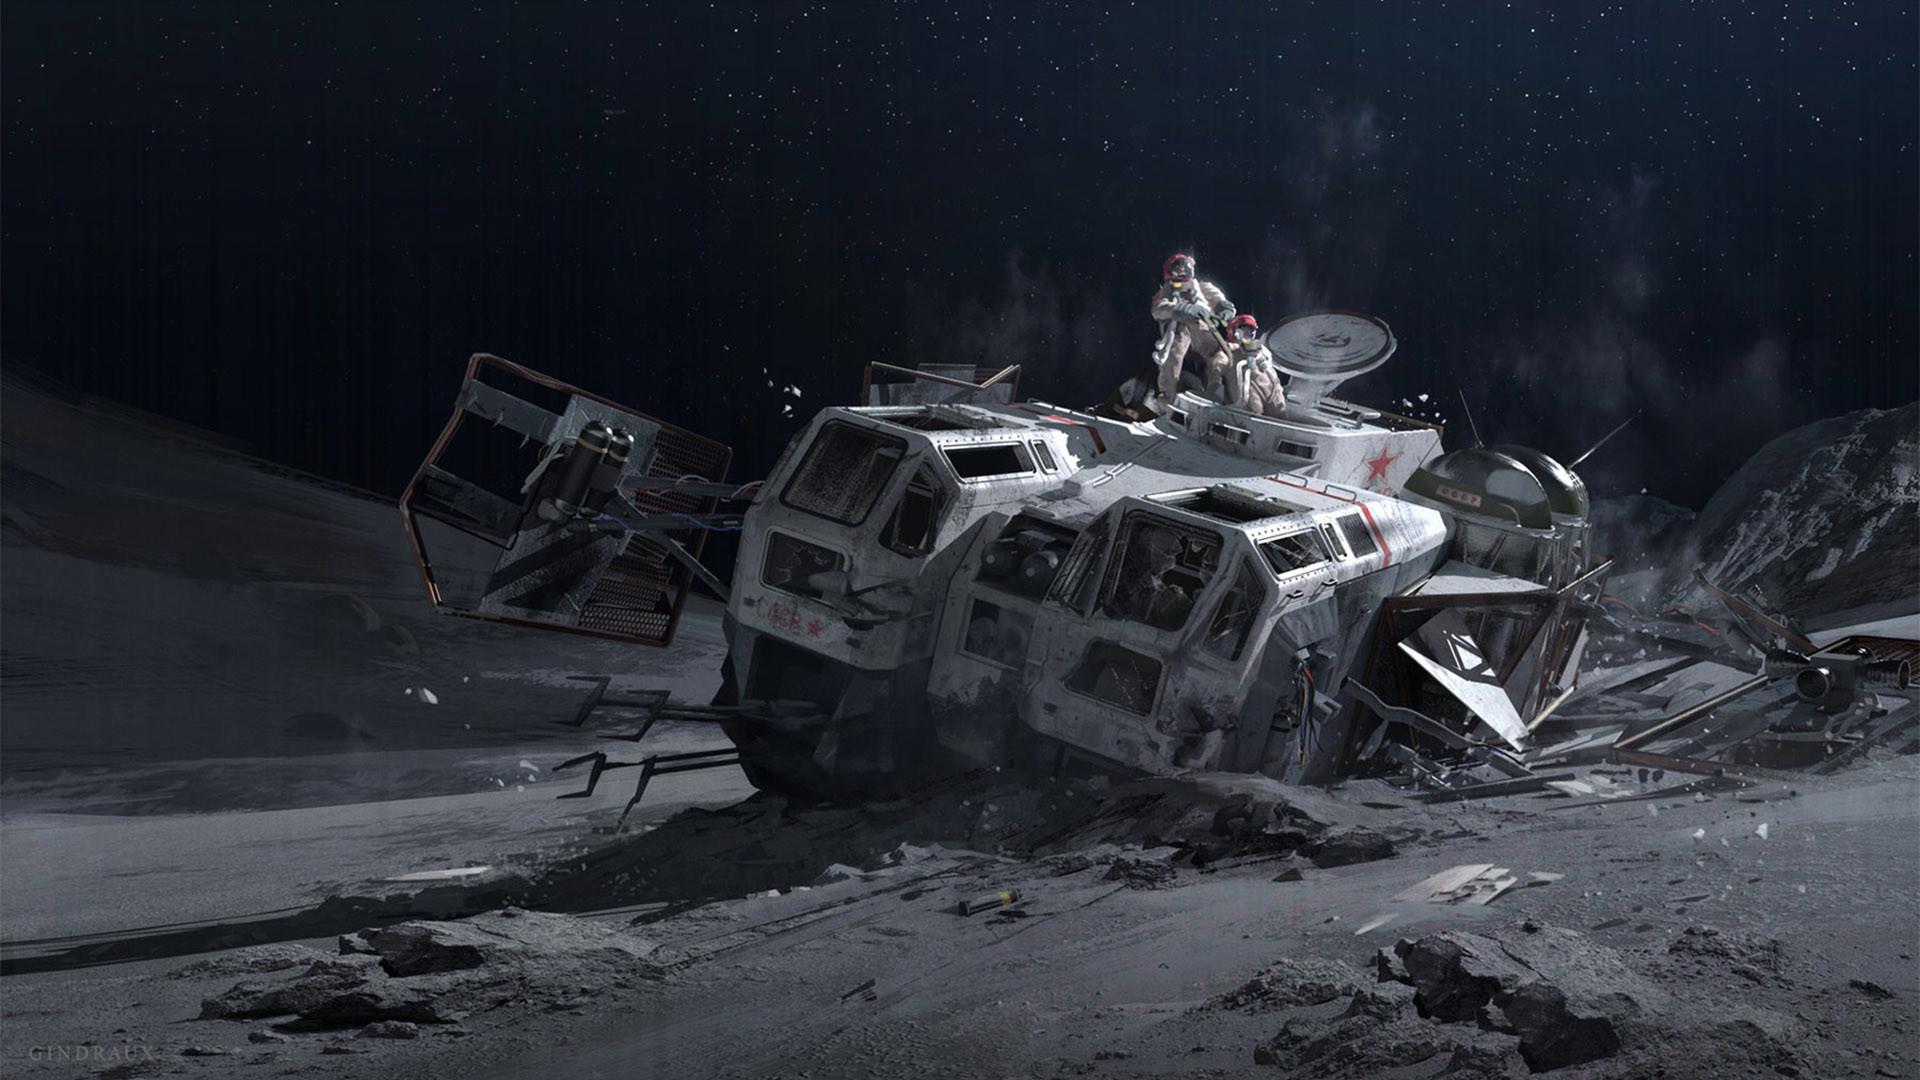 Space or Sci-fi Wallpaper